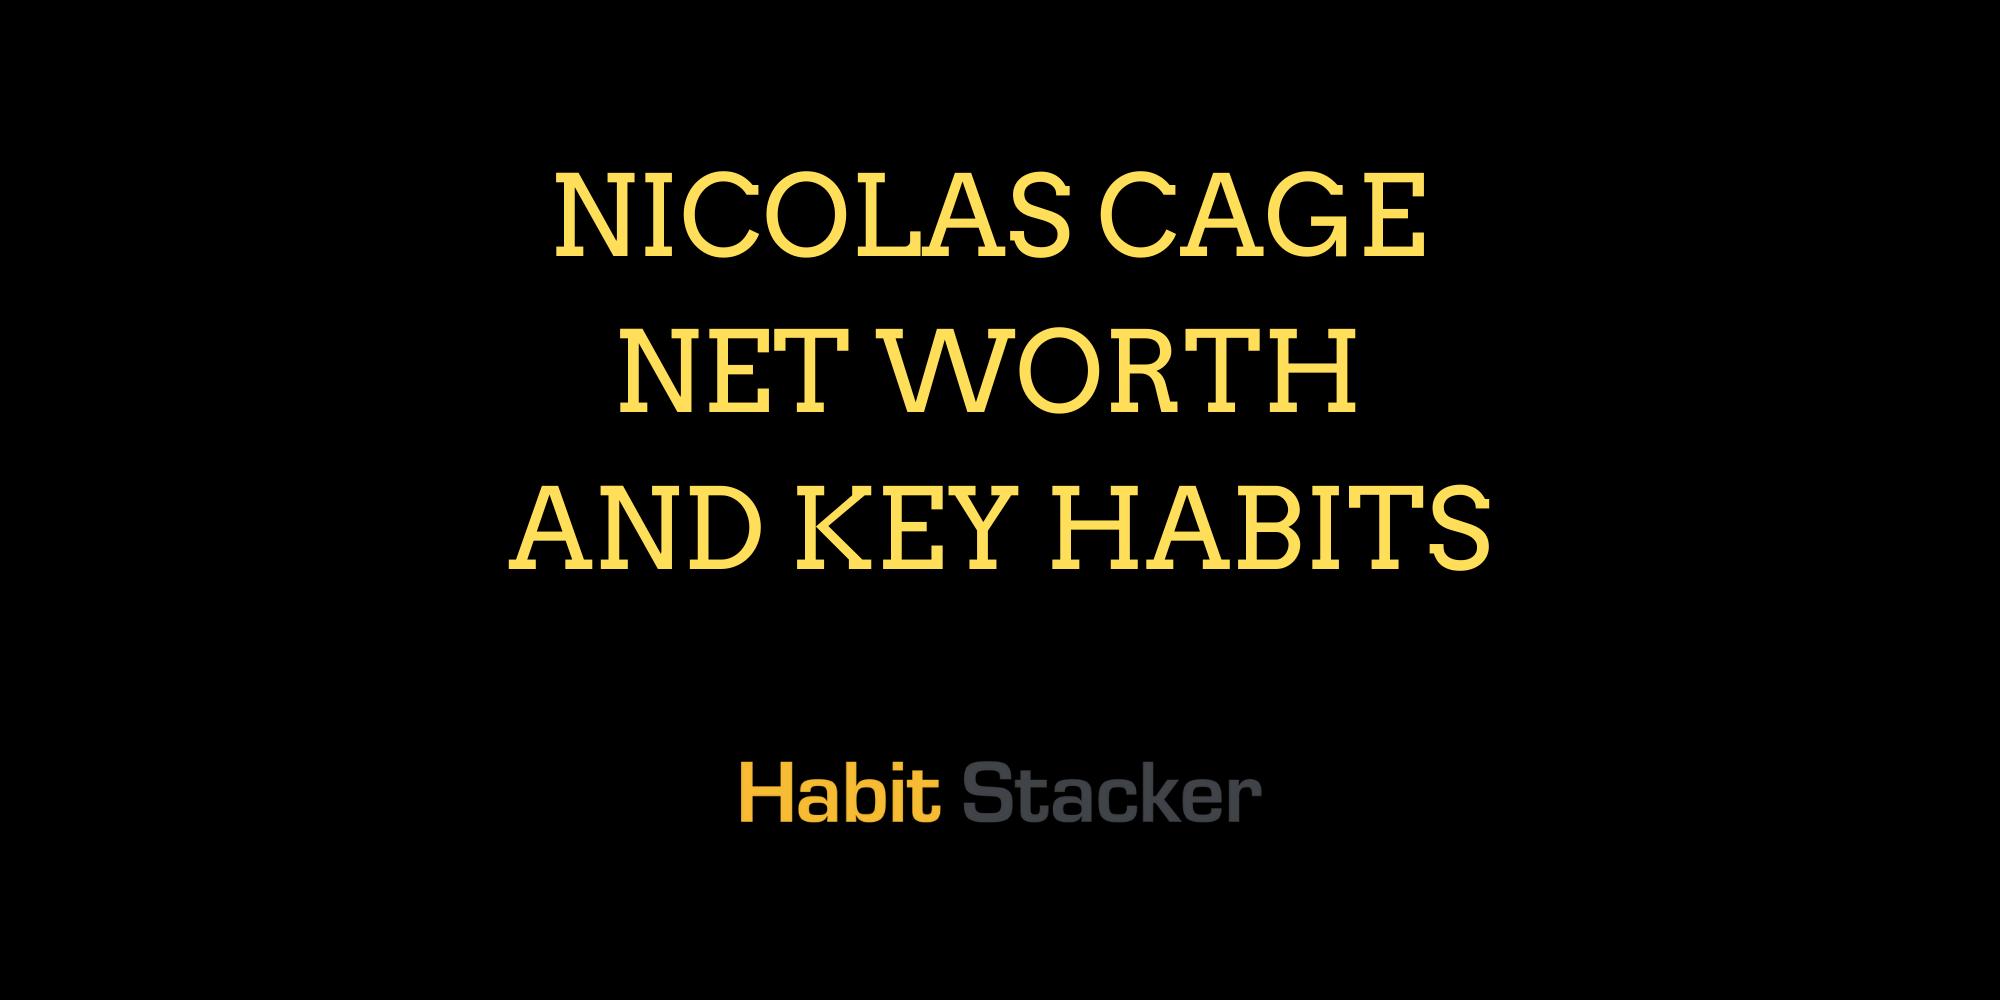 Nicolas Cage Net Worth and Key Habits